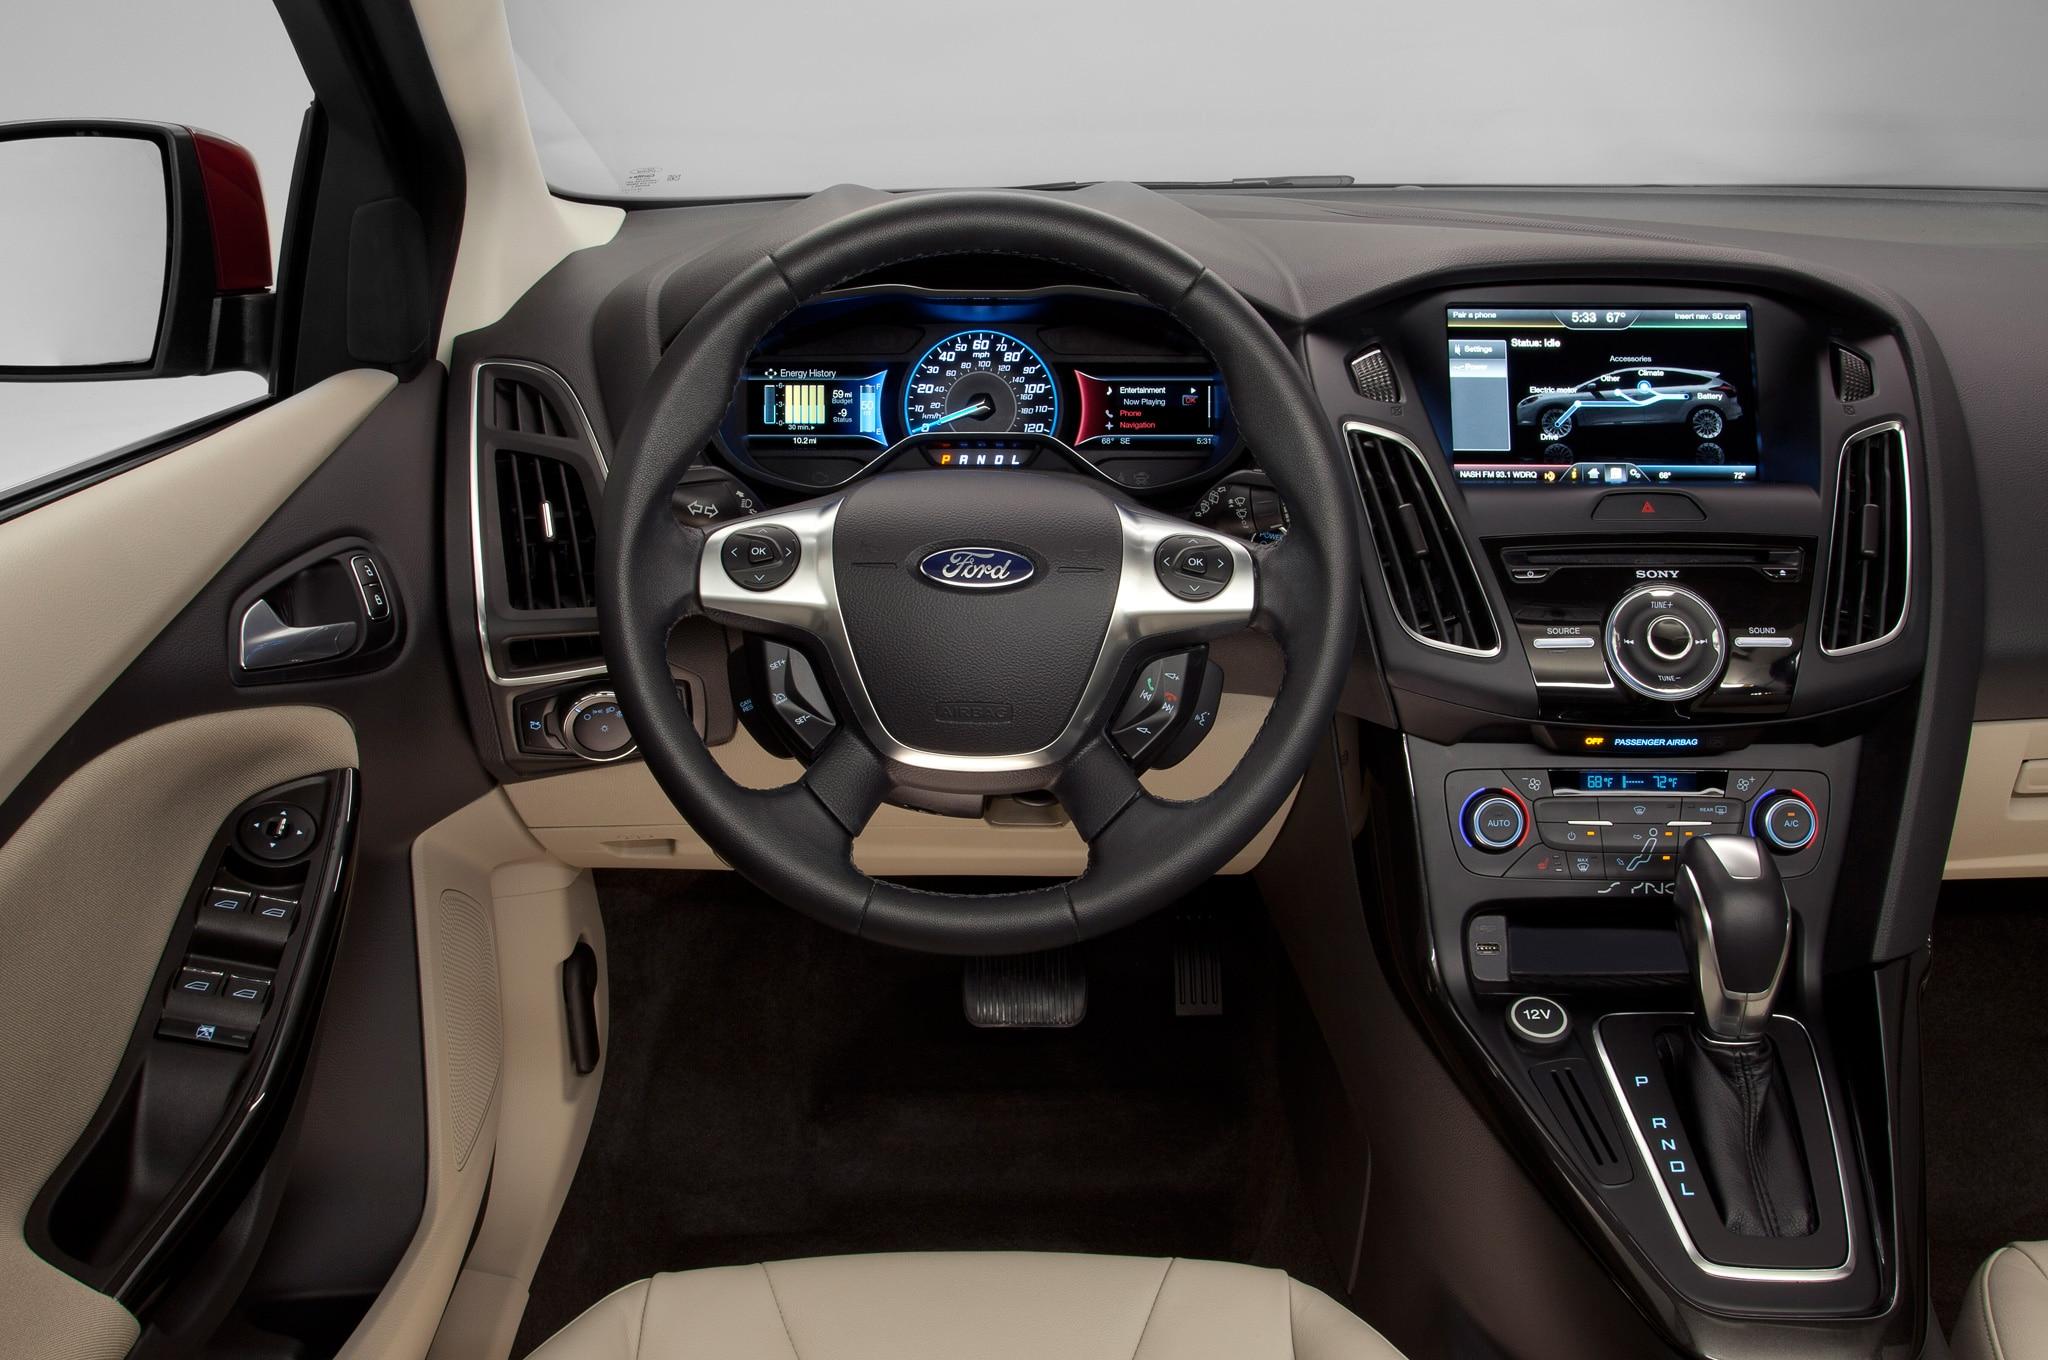 2015 ford focus sedan black. show more 2015 ford focus sedan black